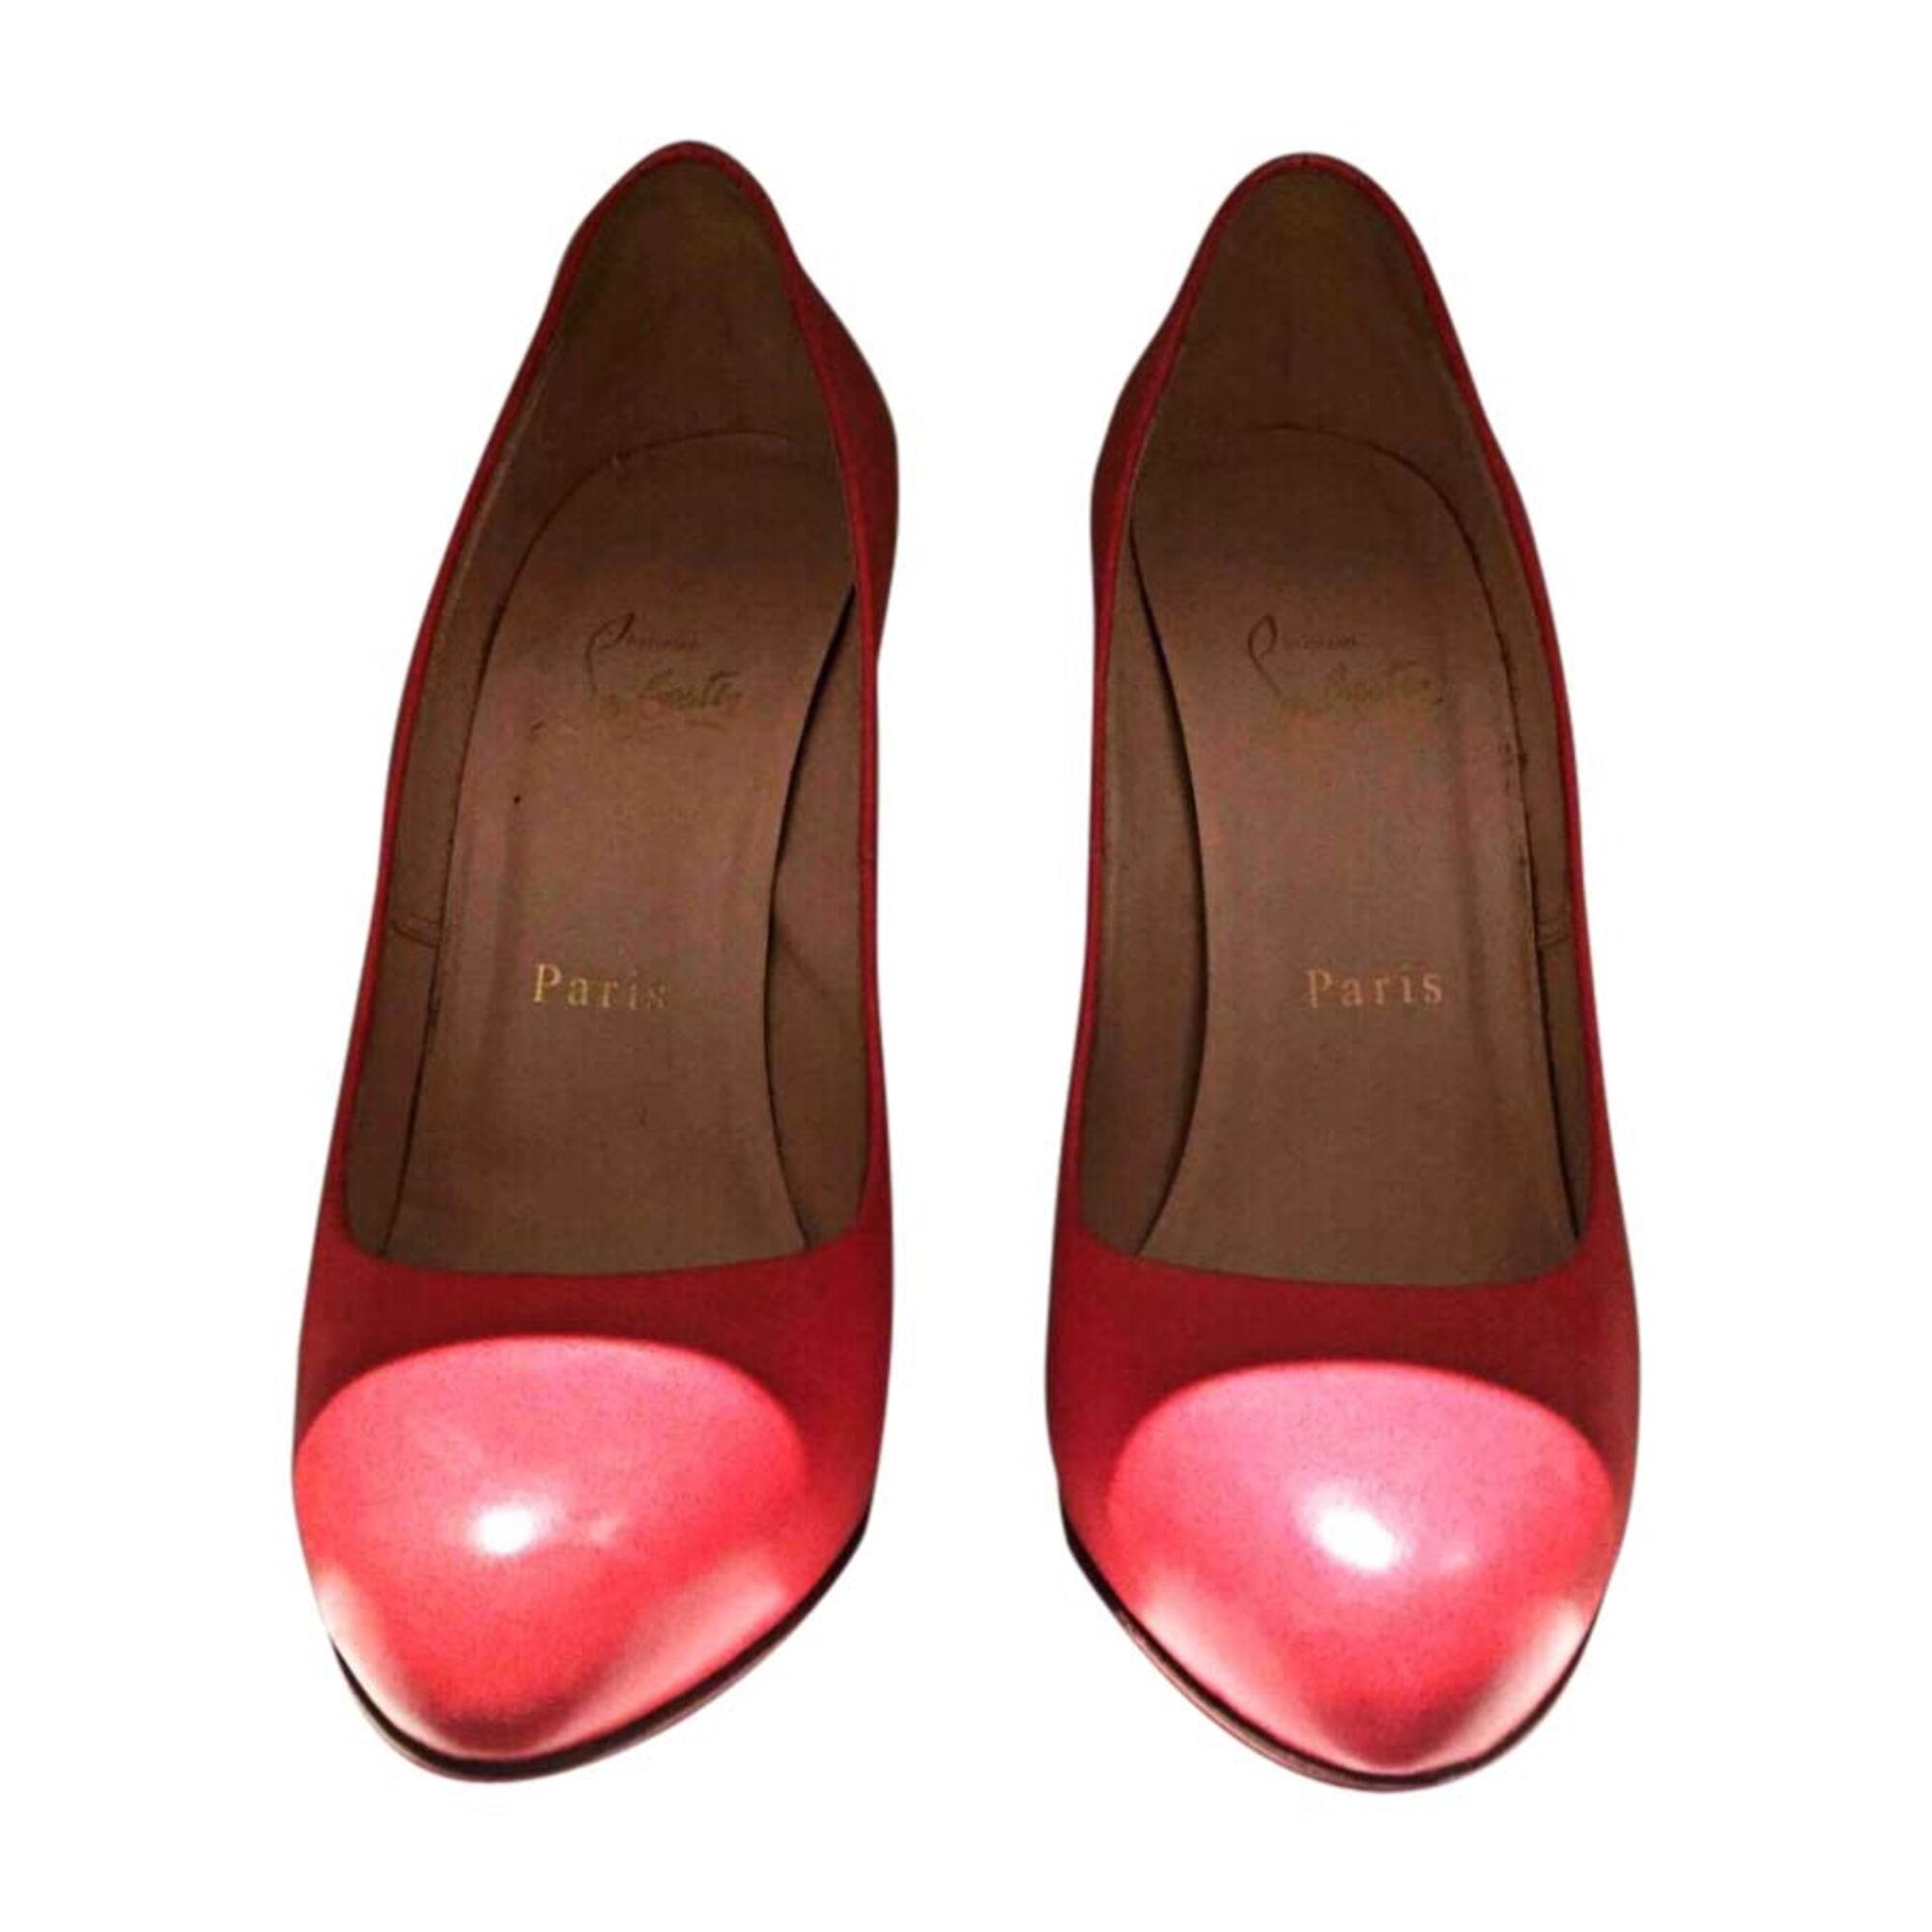 louboutin chaussures aix en provence